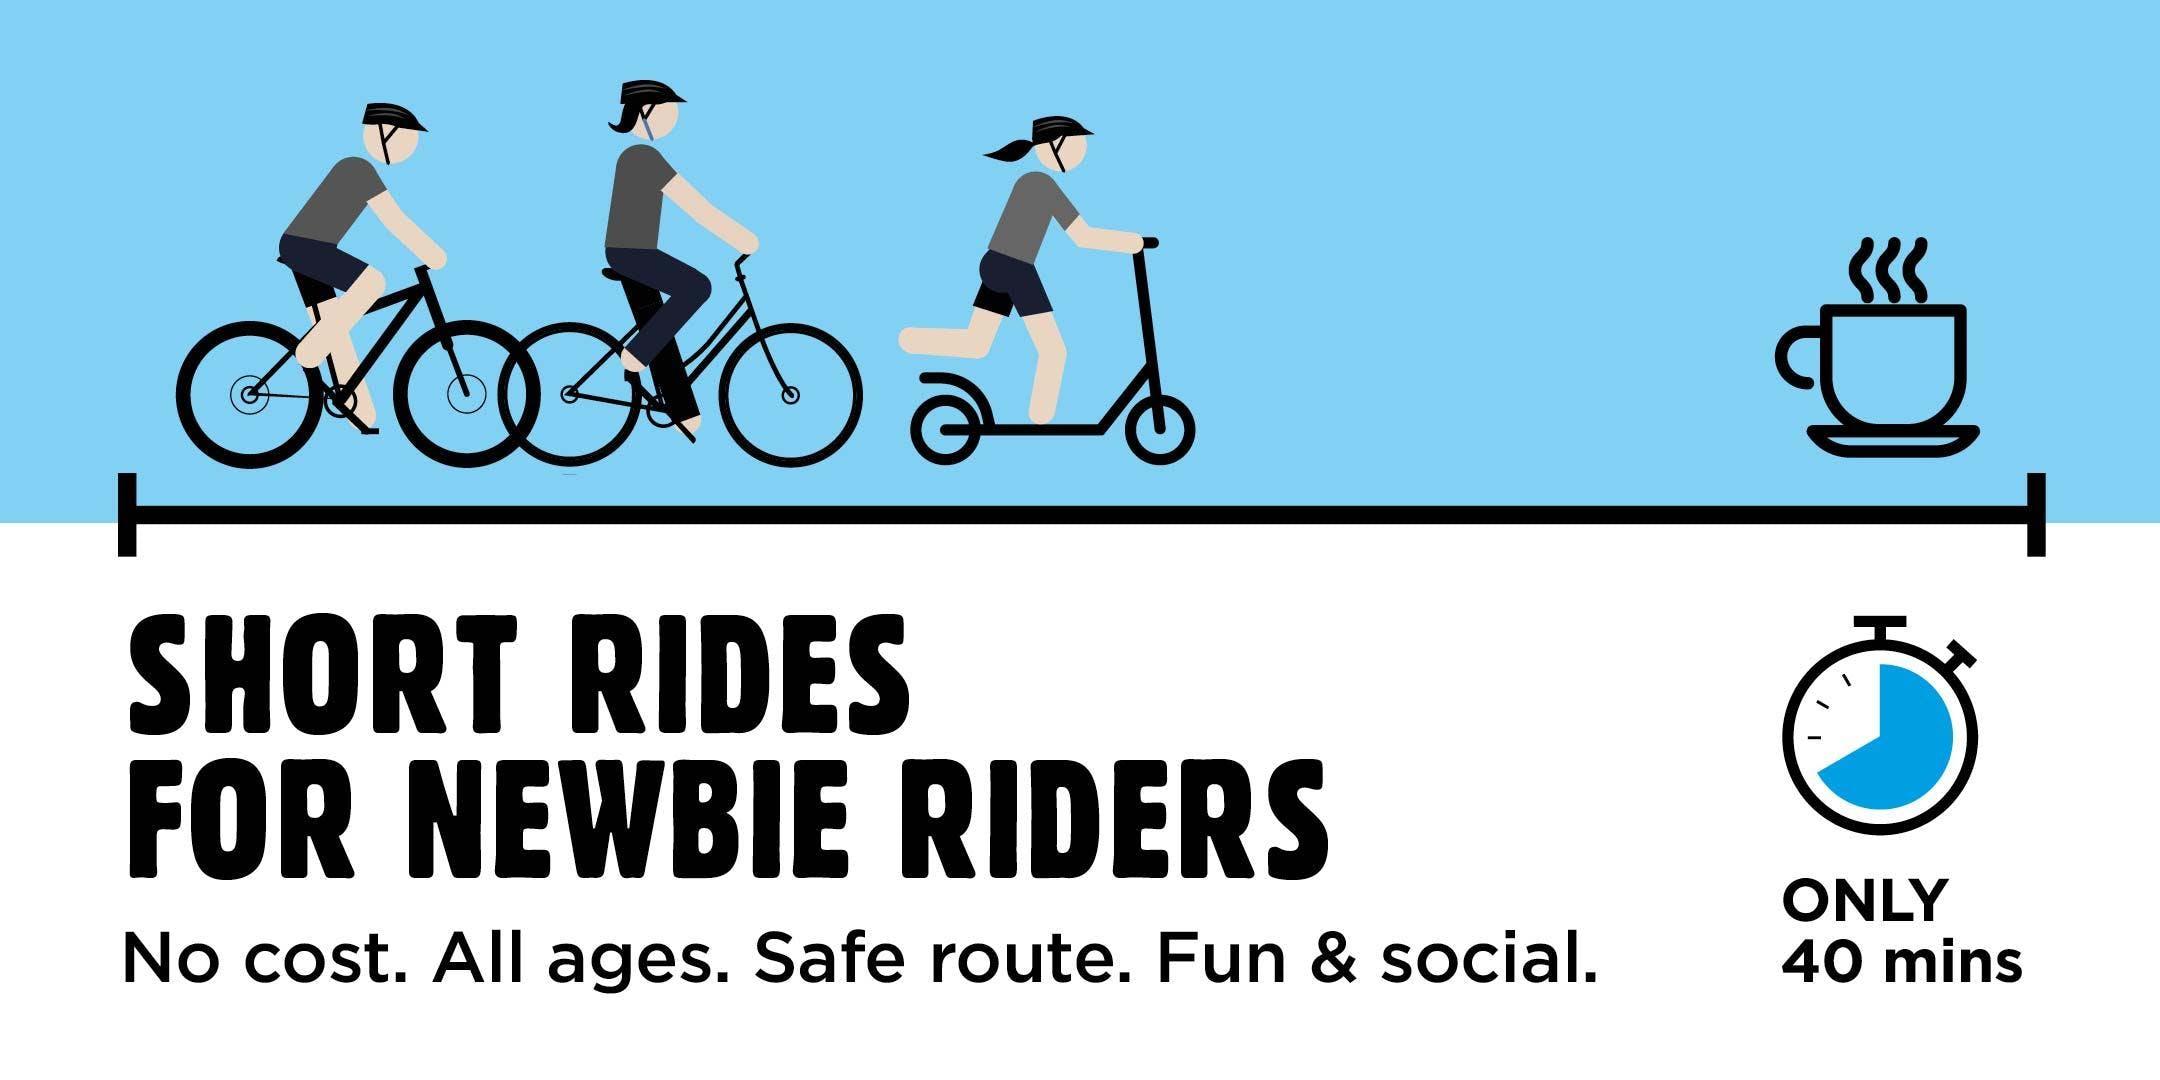 Neighbourly Ride - Southbank